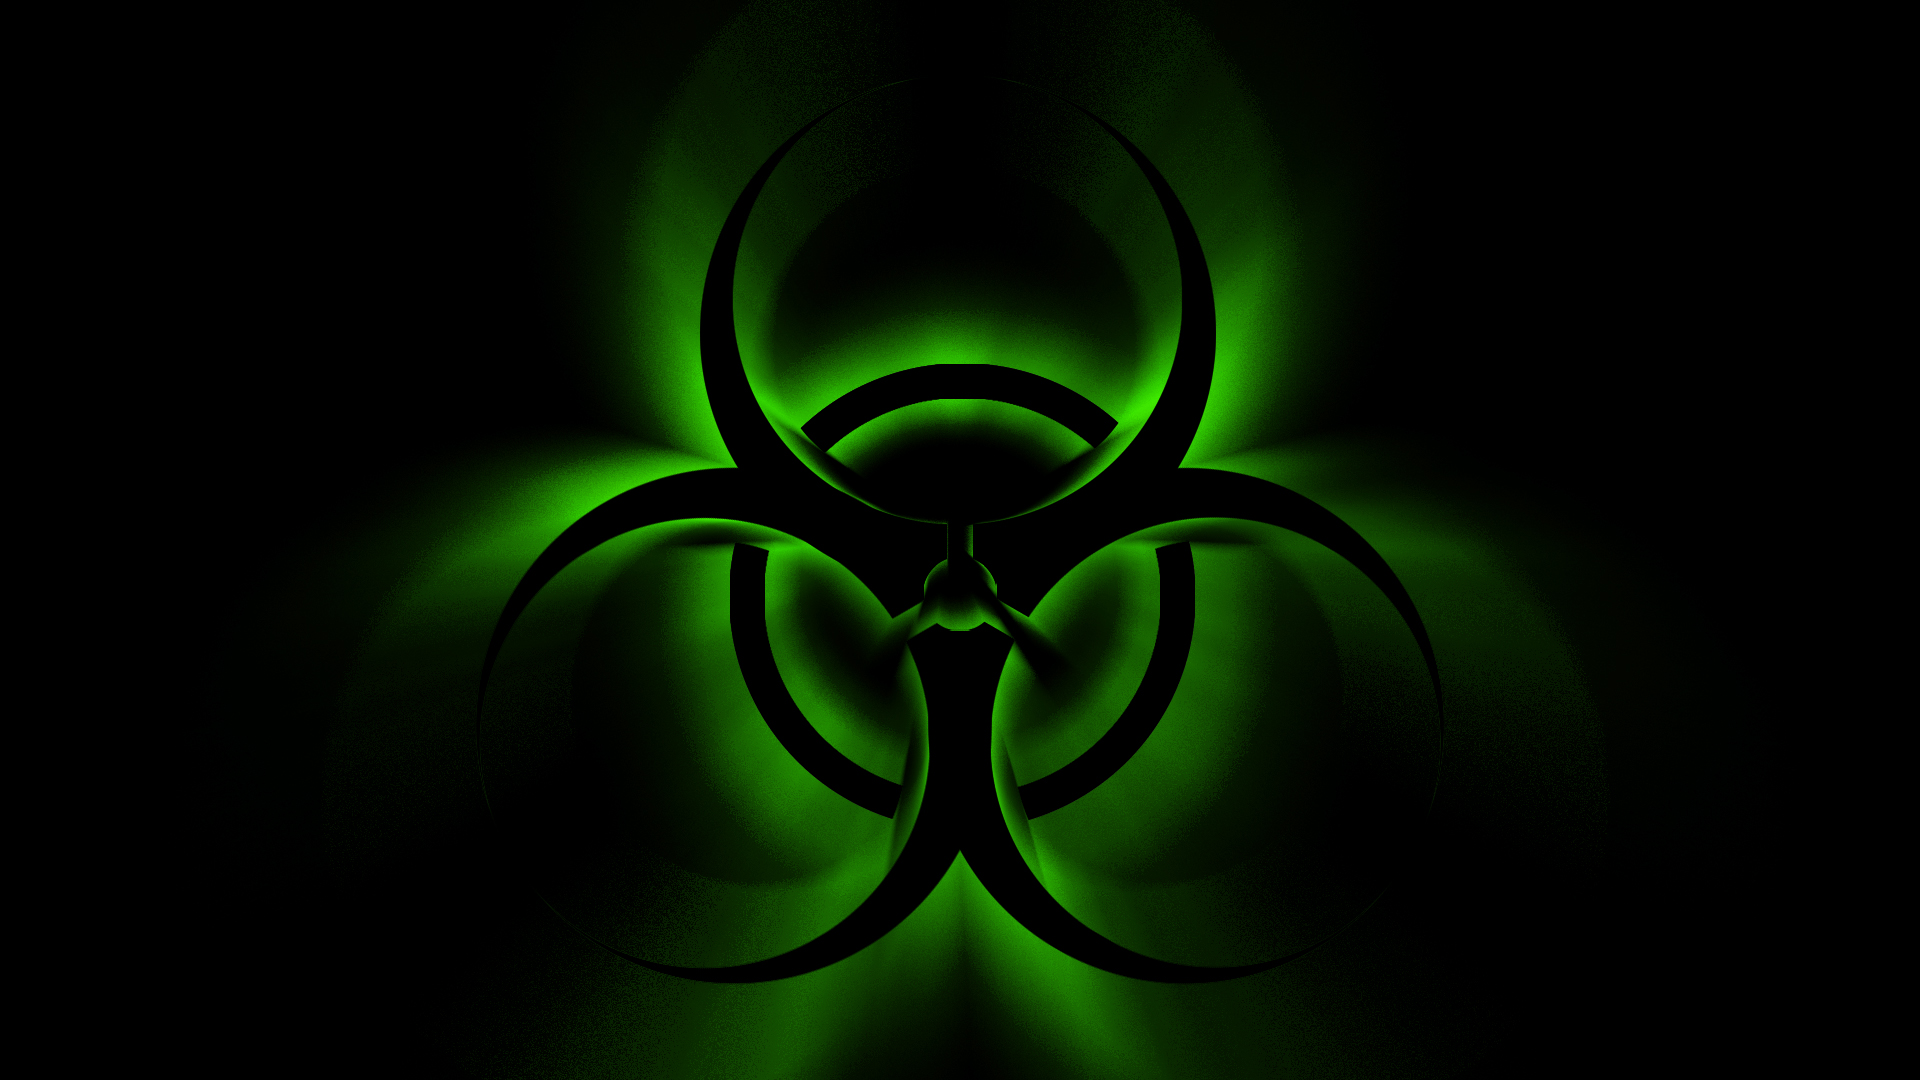 Biohazard wallpaper 133375 1920x1080